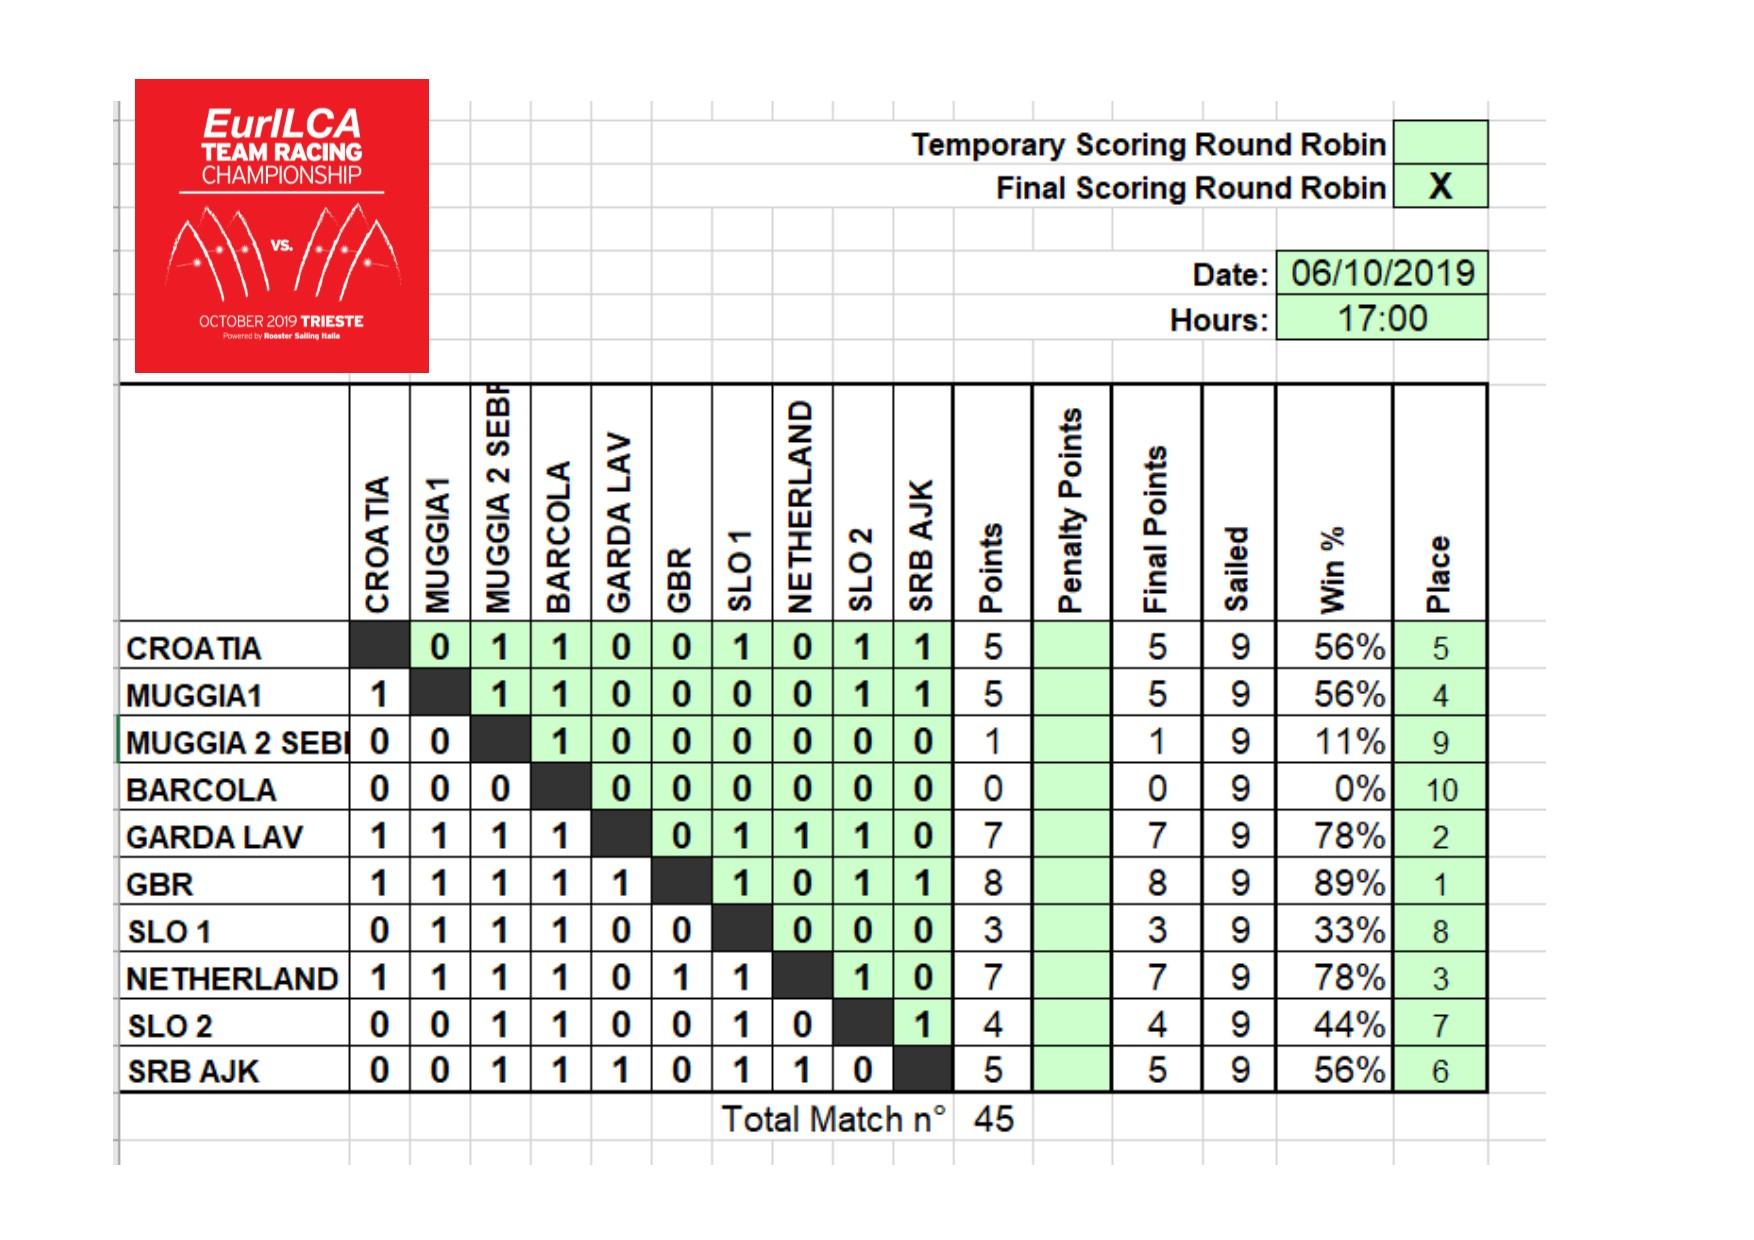 eurilca team racing results